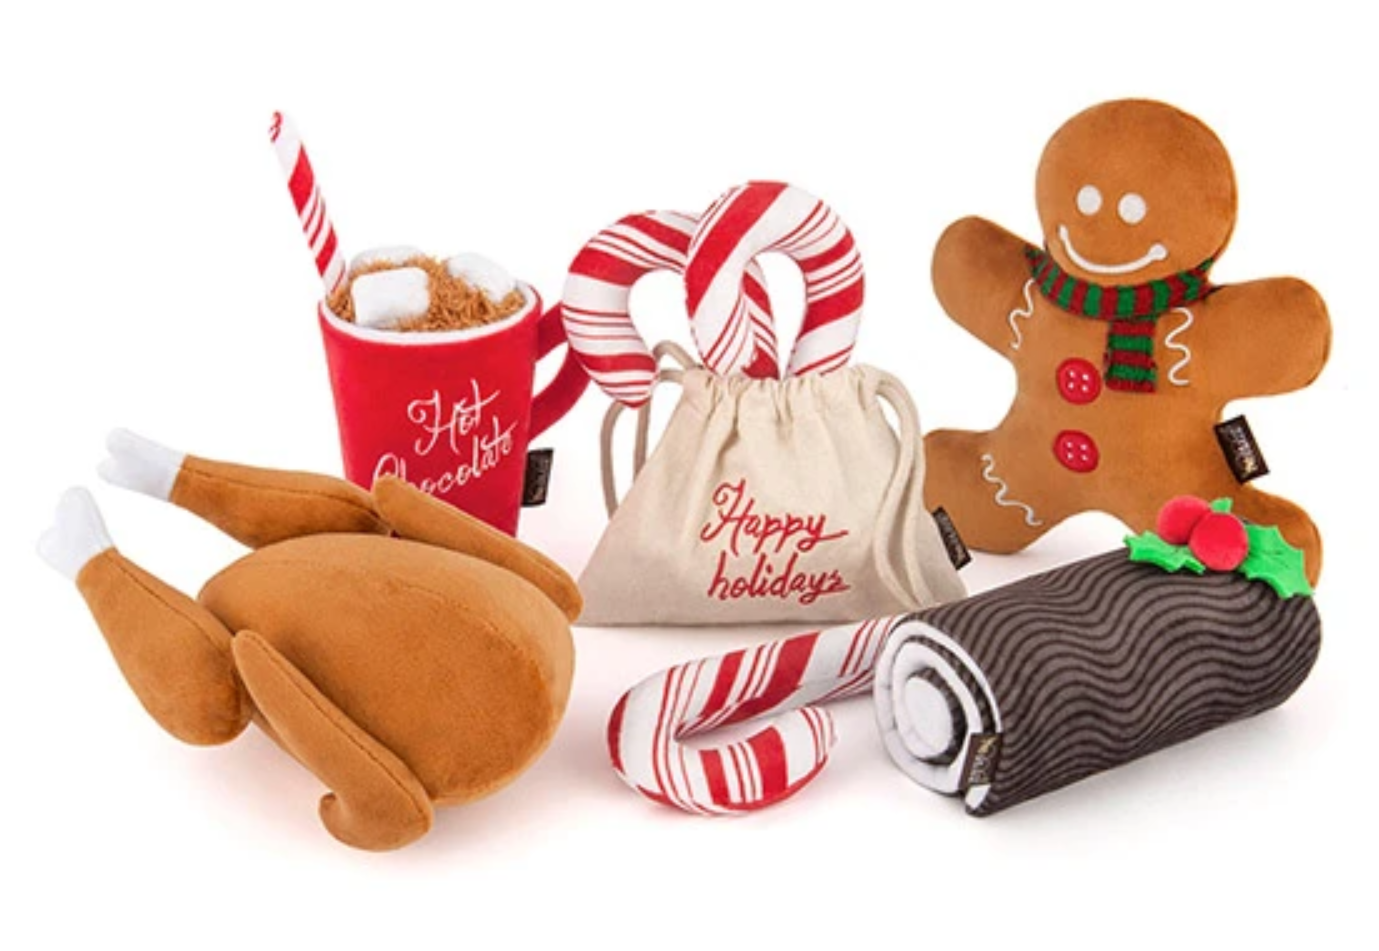 PLAY p.l.a.y. stevige kerstknuffels kerst knuffels hond honden Holiday Toys kerstdagen